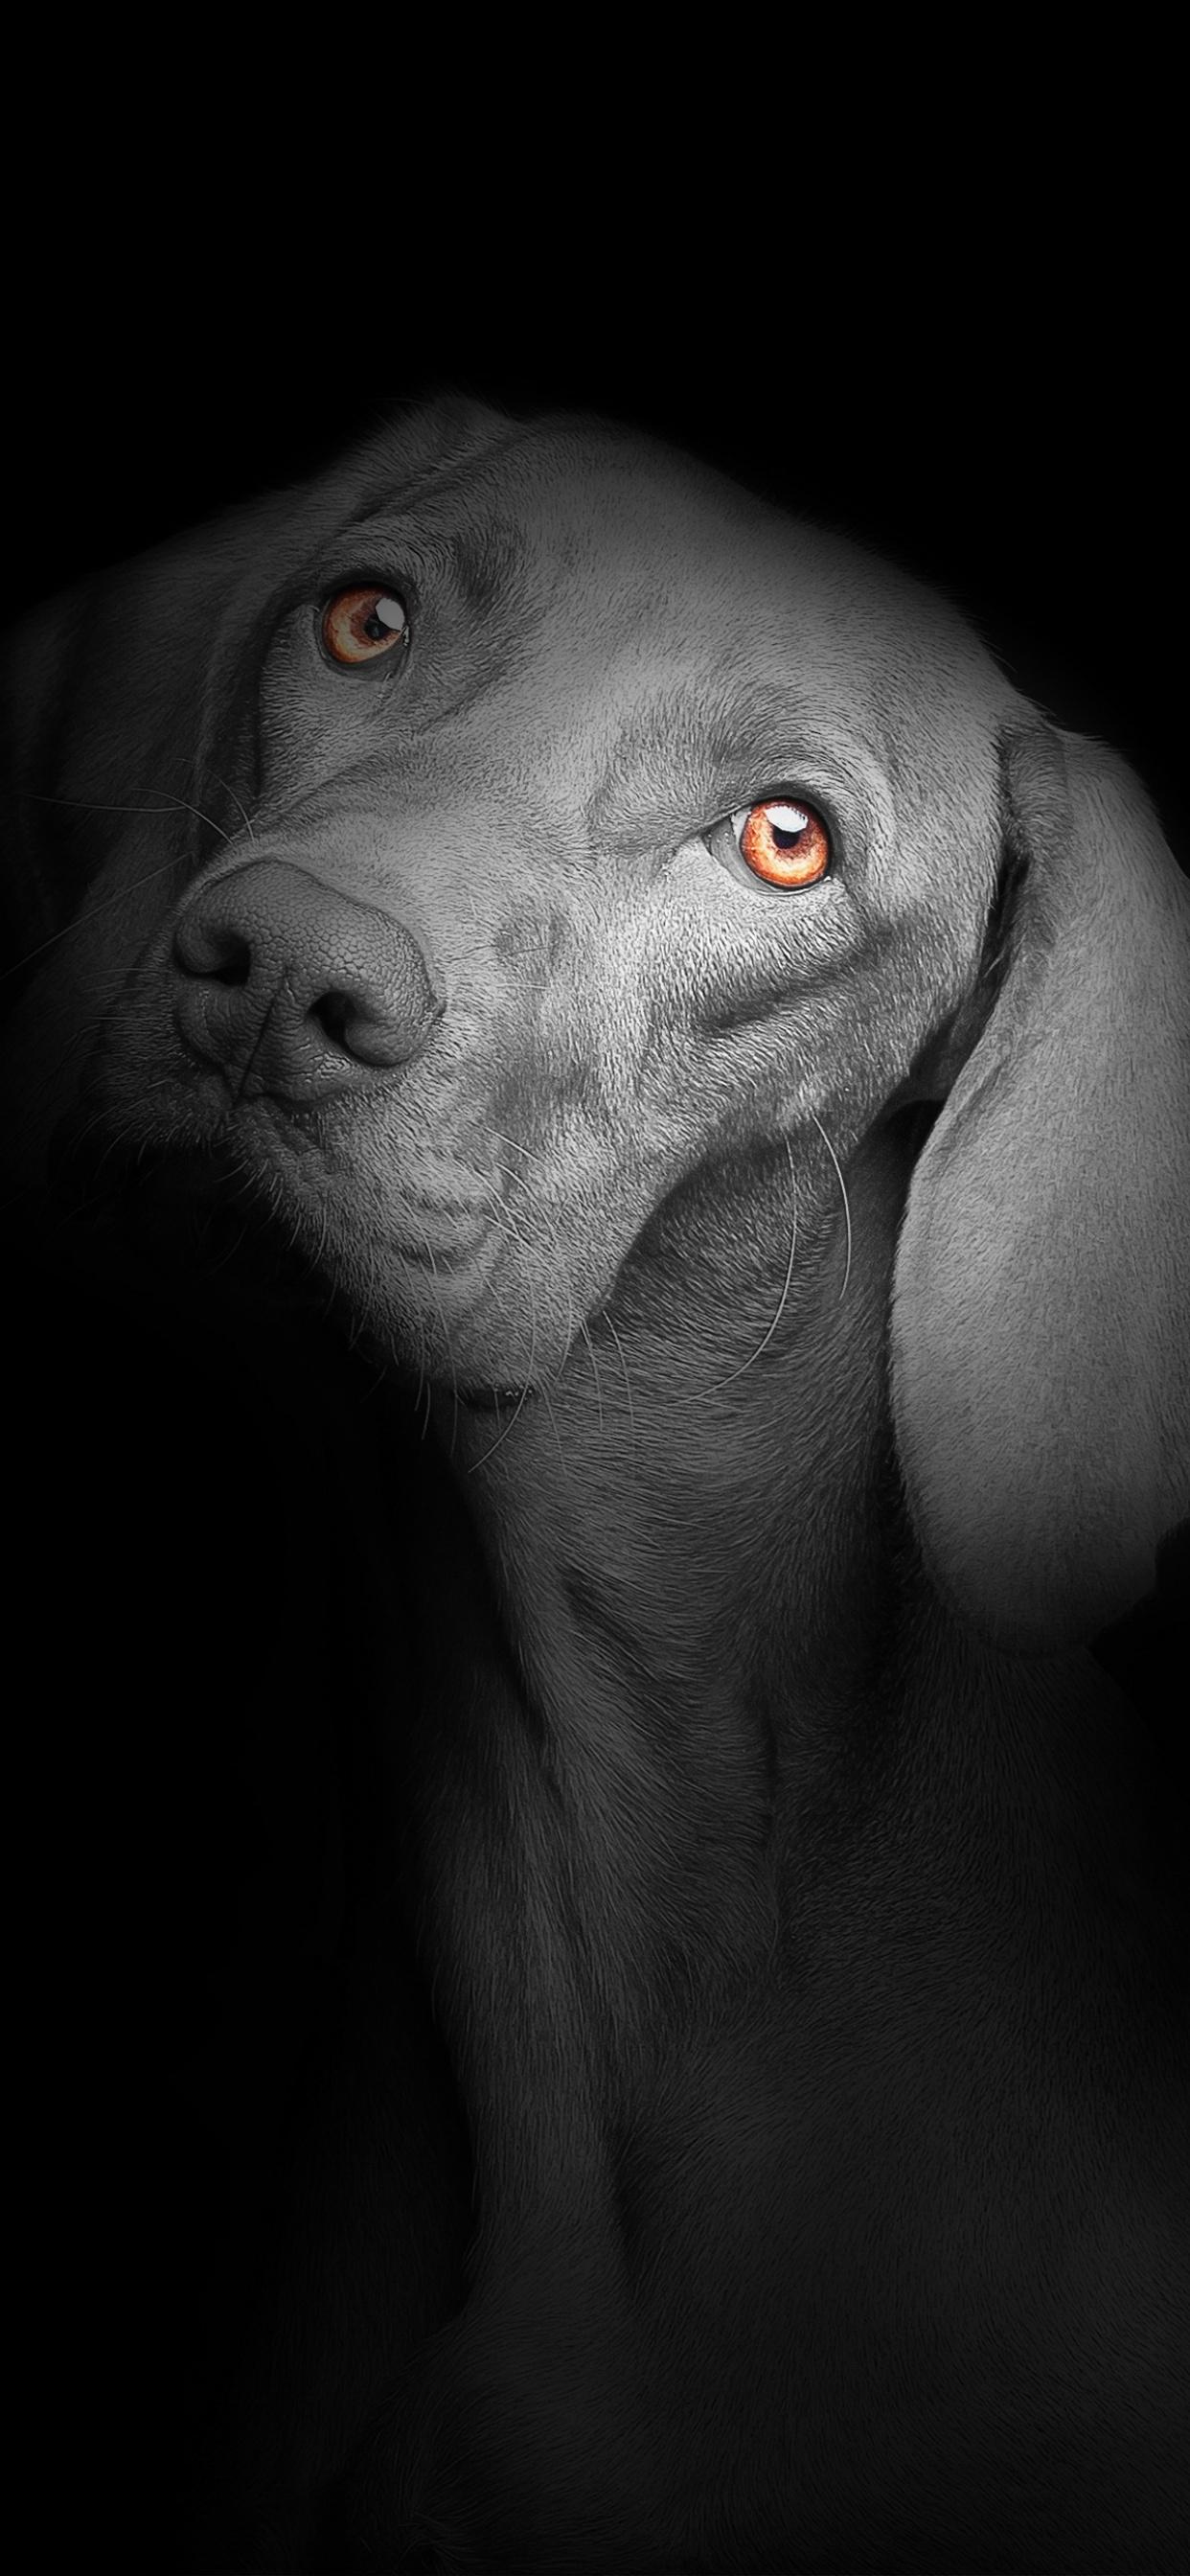 Black dog 4K Wallpaper, Black background, Dark, AMOLED ...